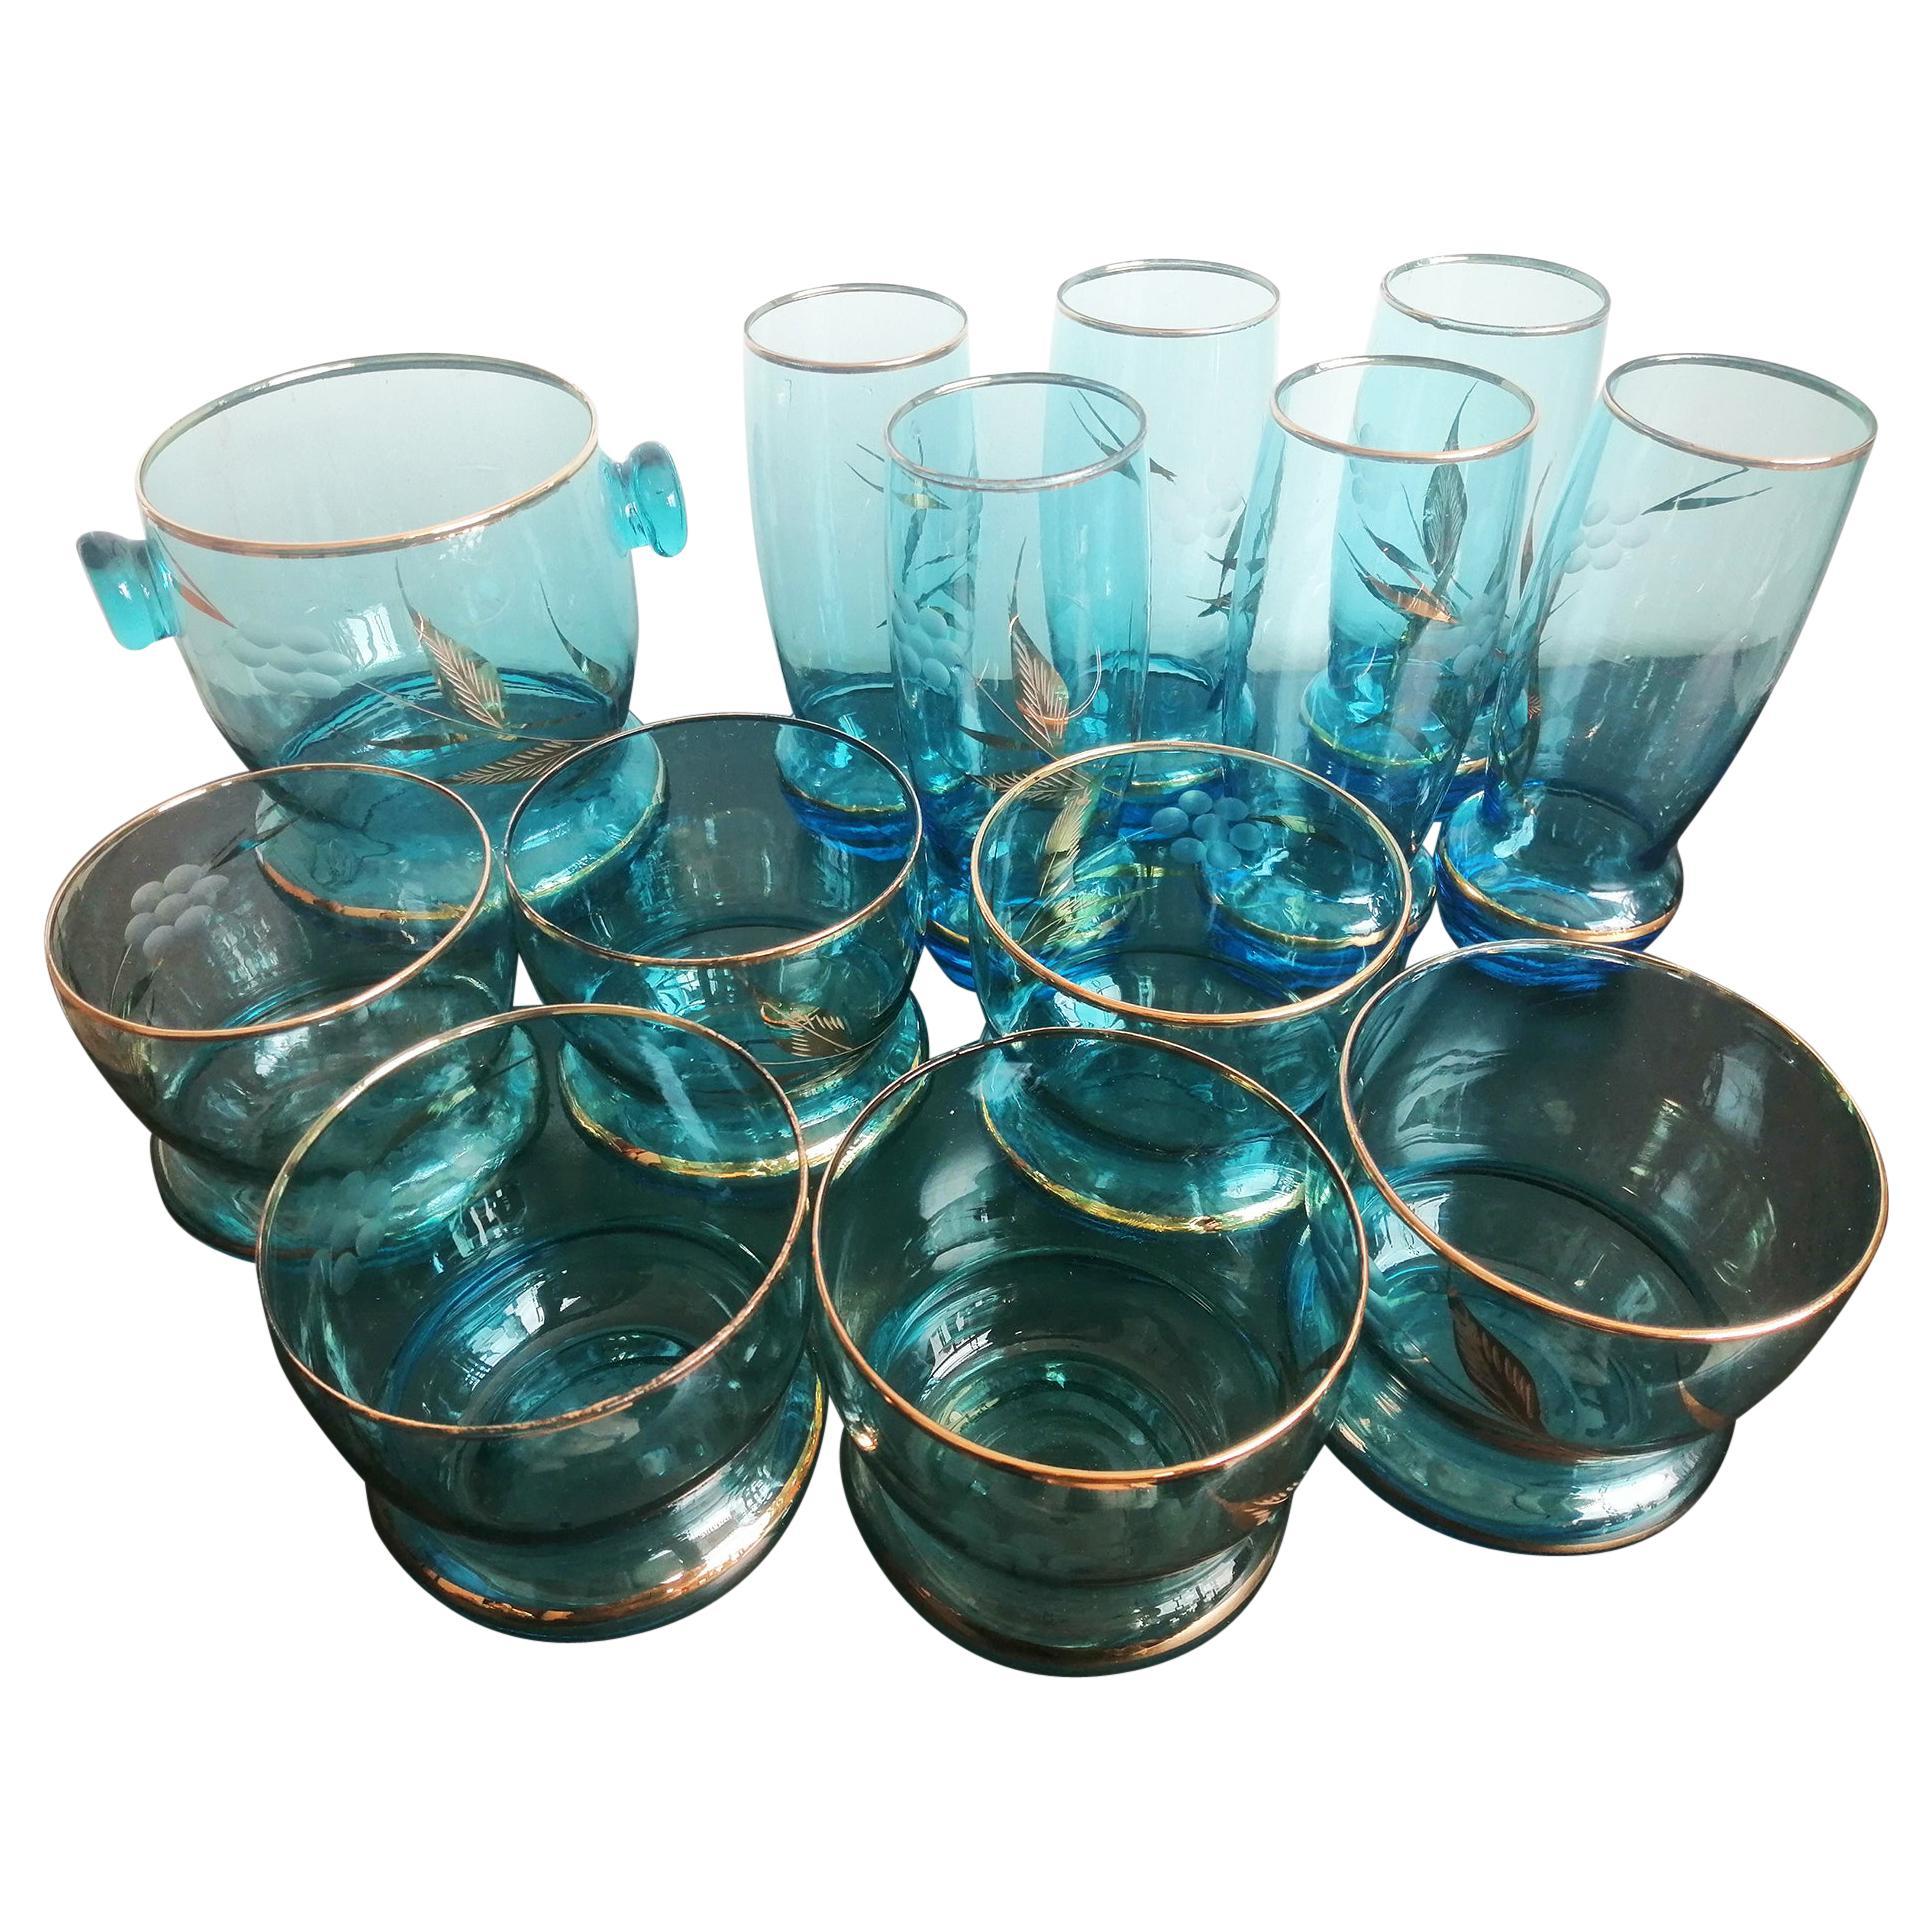 Set of 12 Bohemian Crystal Glasses and Glass Ice Bucket, Czechoslovakia, 1950s